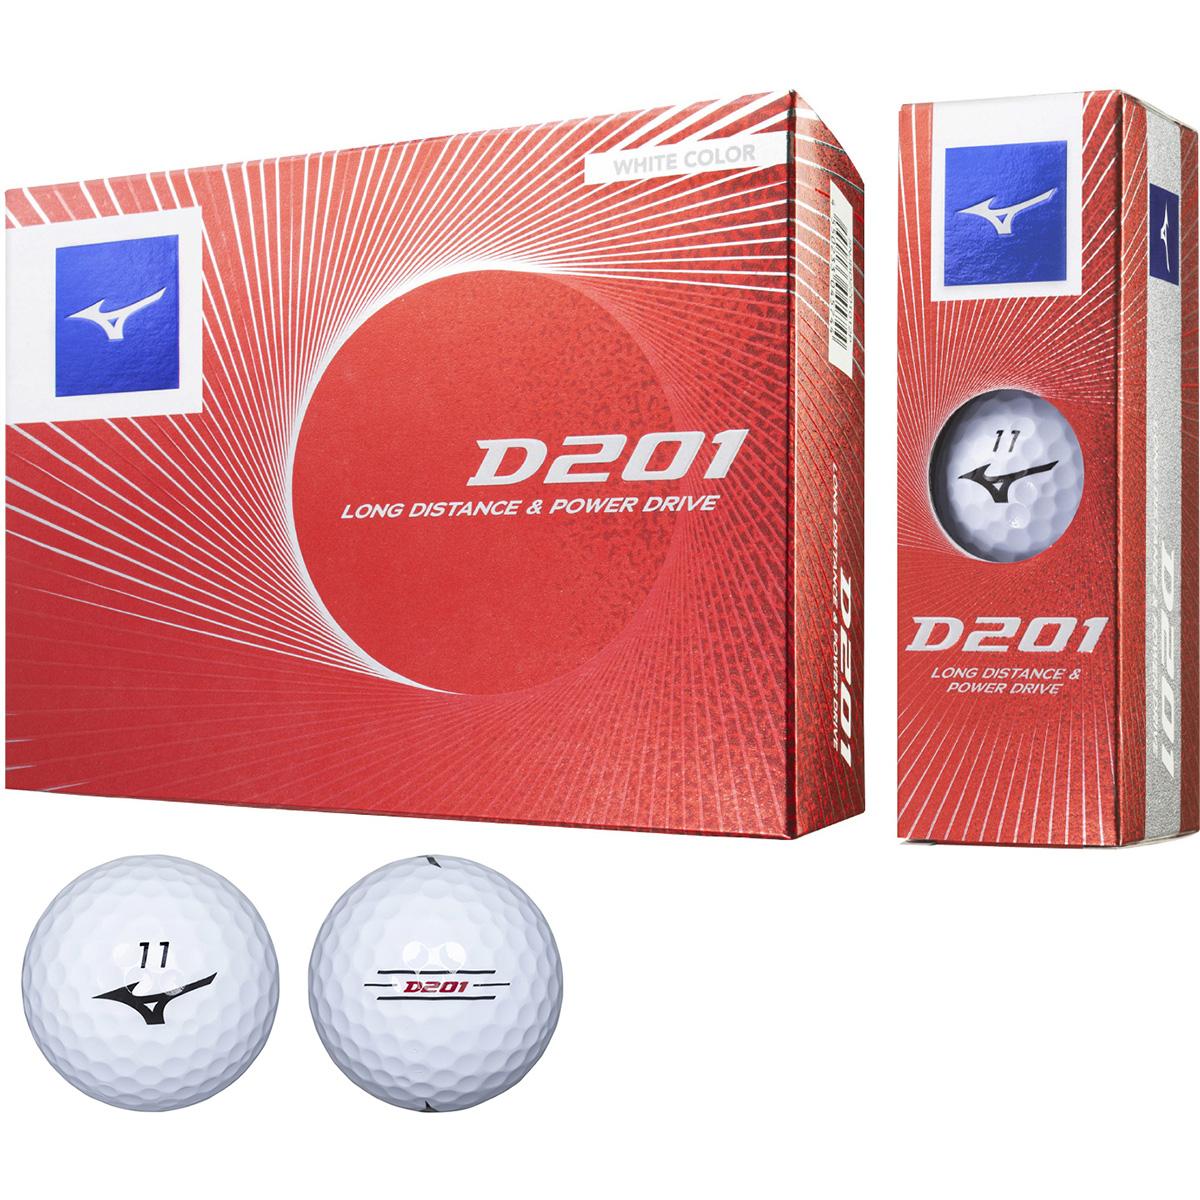 D201 ゴルフボール